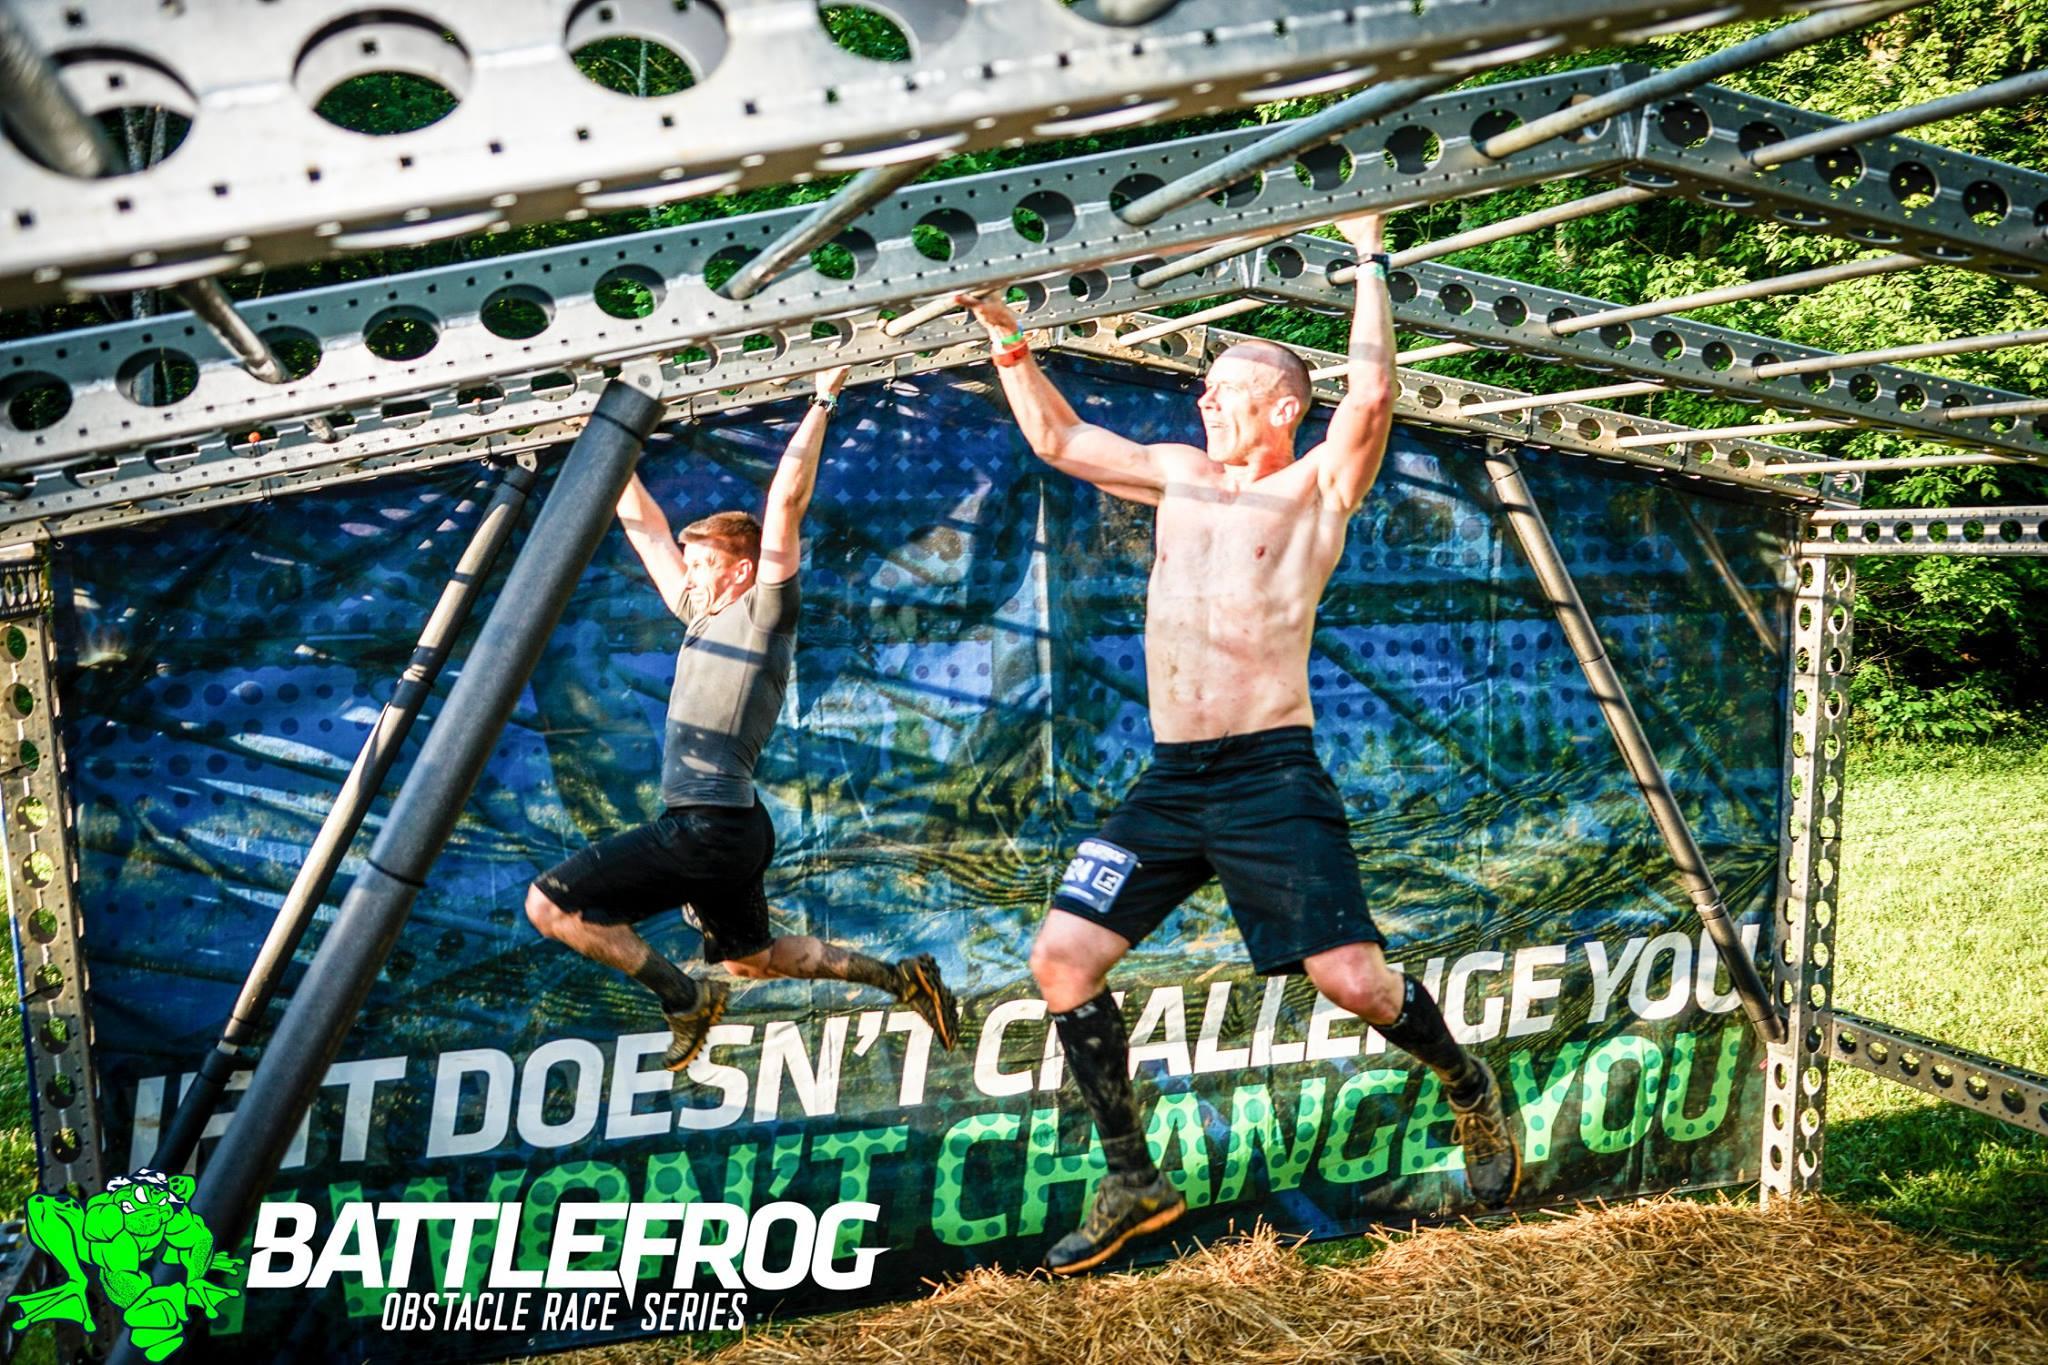 Battlefrog-Louisville-2016-Race-Recap-Monkey Bars